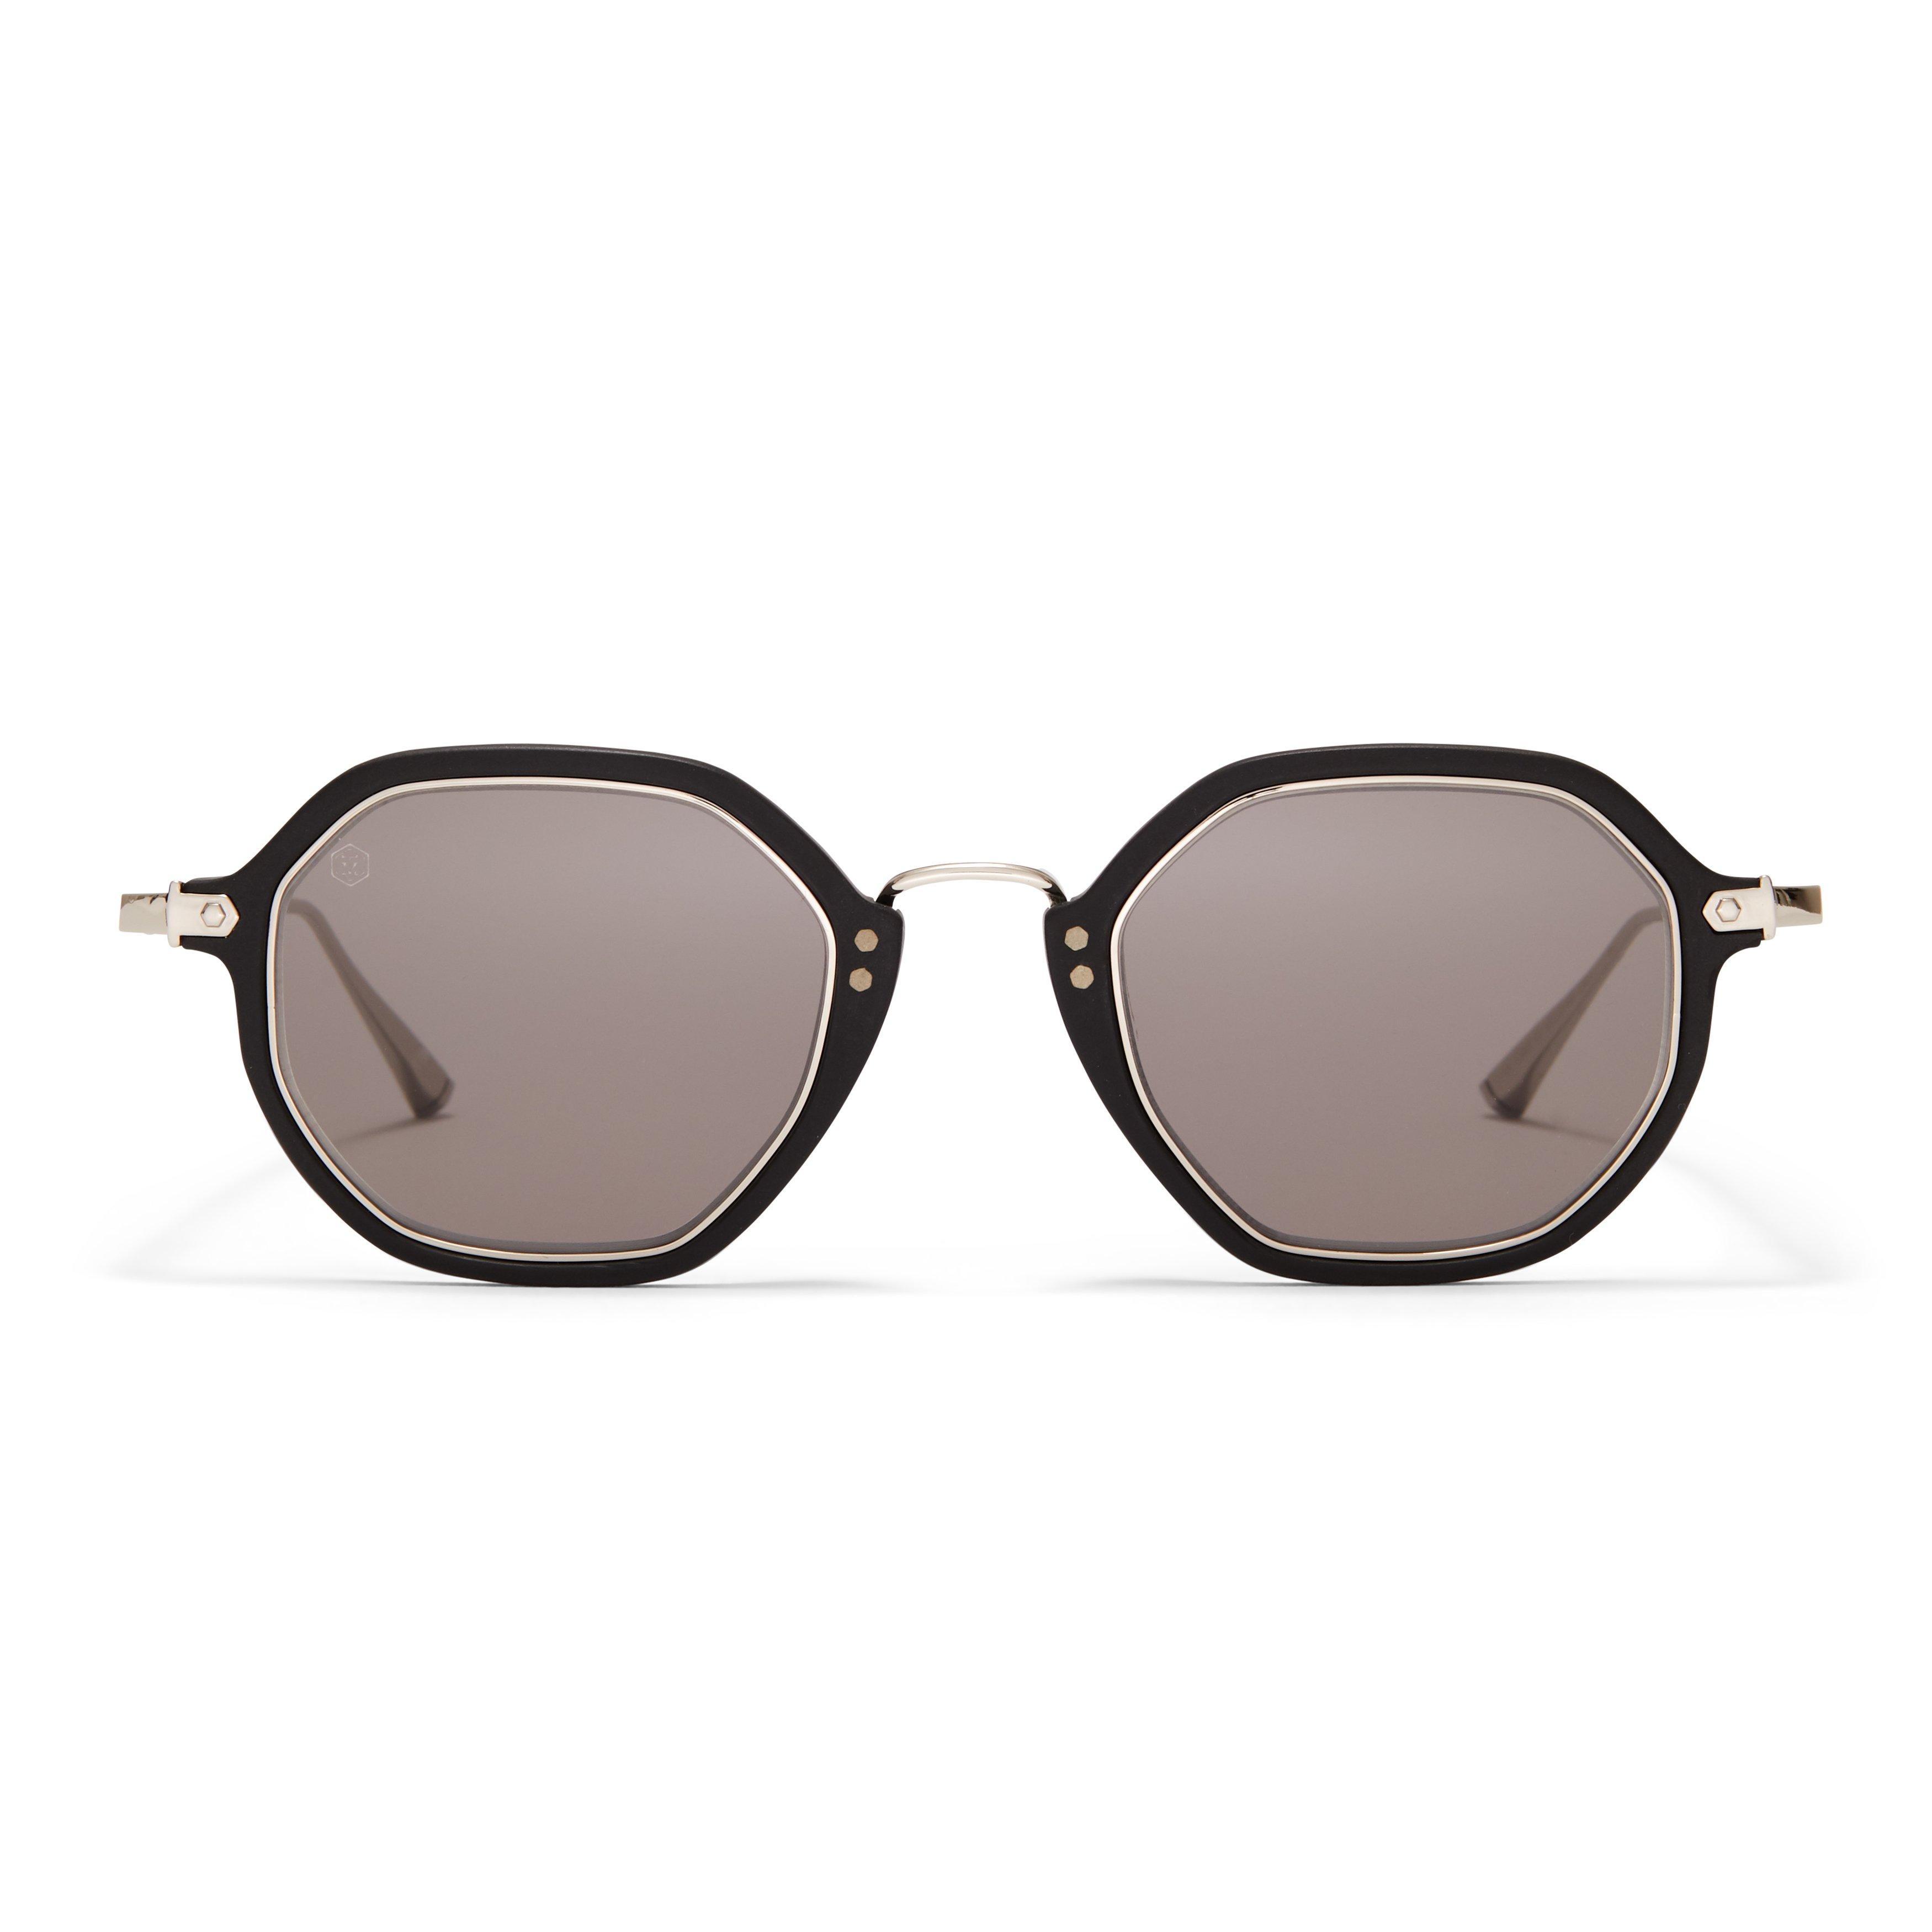 Taylor Morris Westbourne Sunglasses, Non-Prescription Polarised